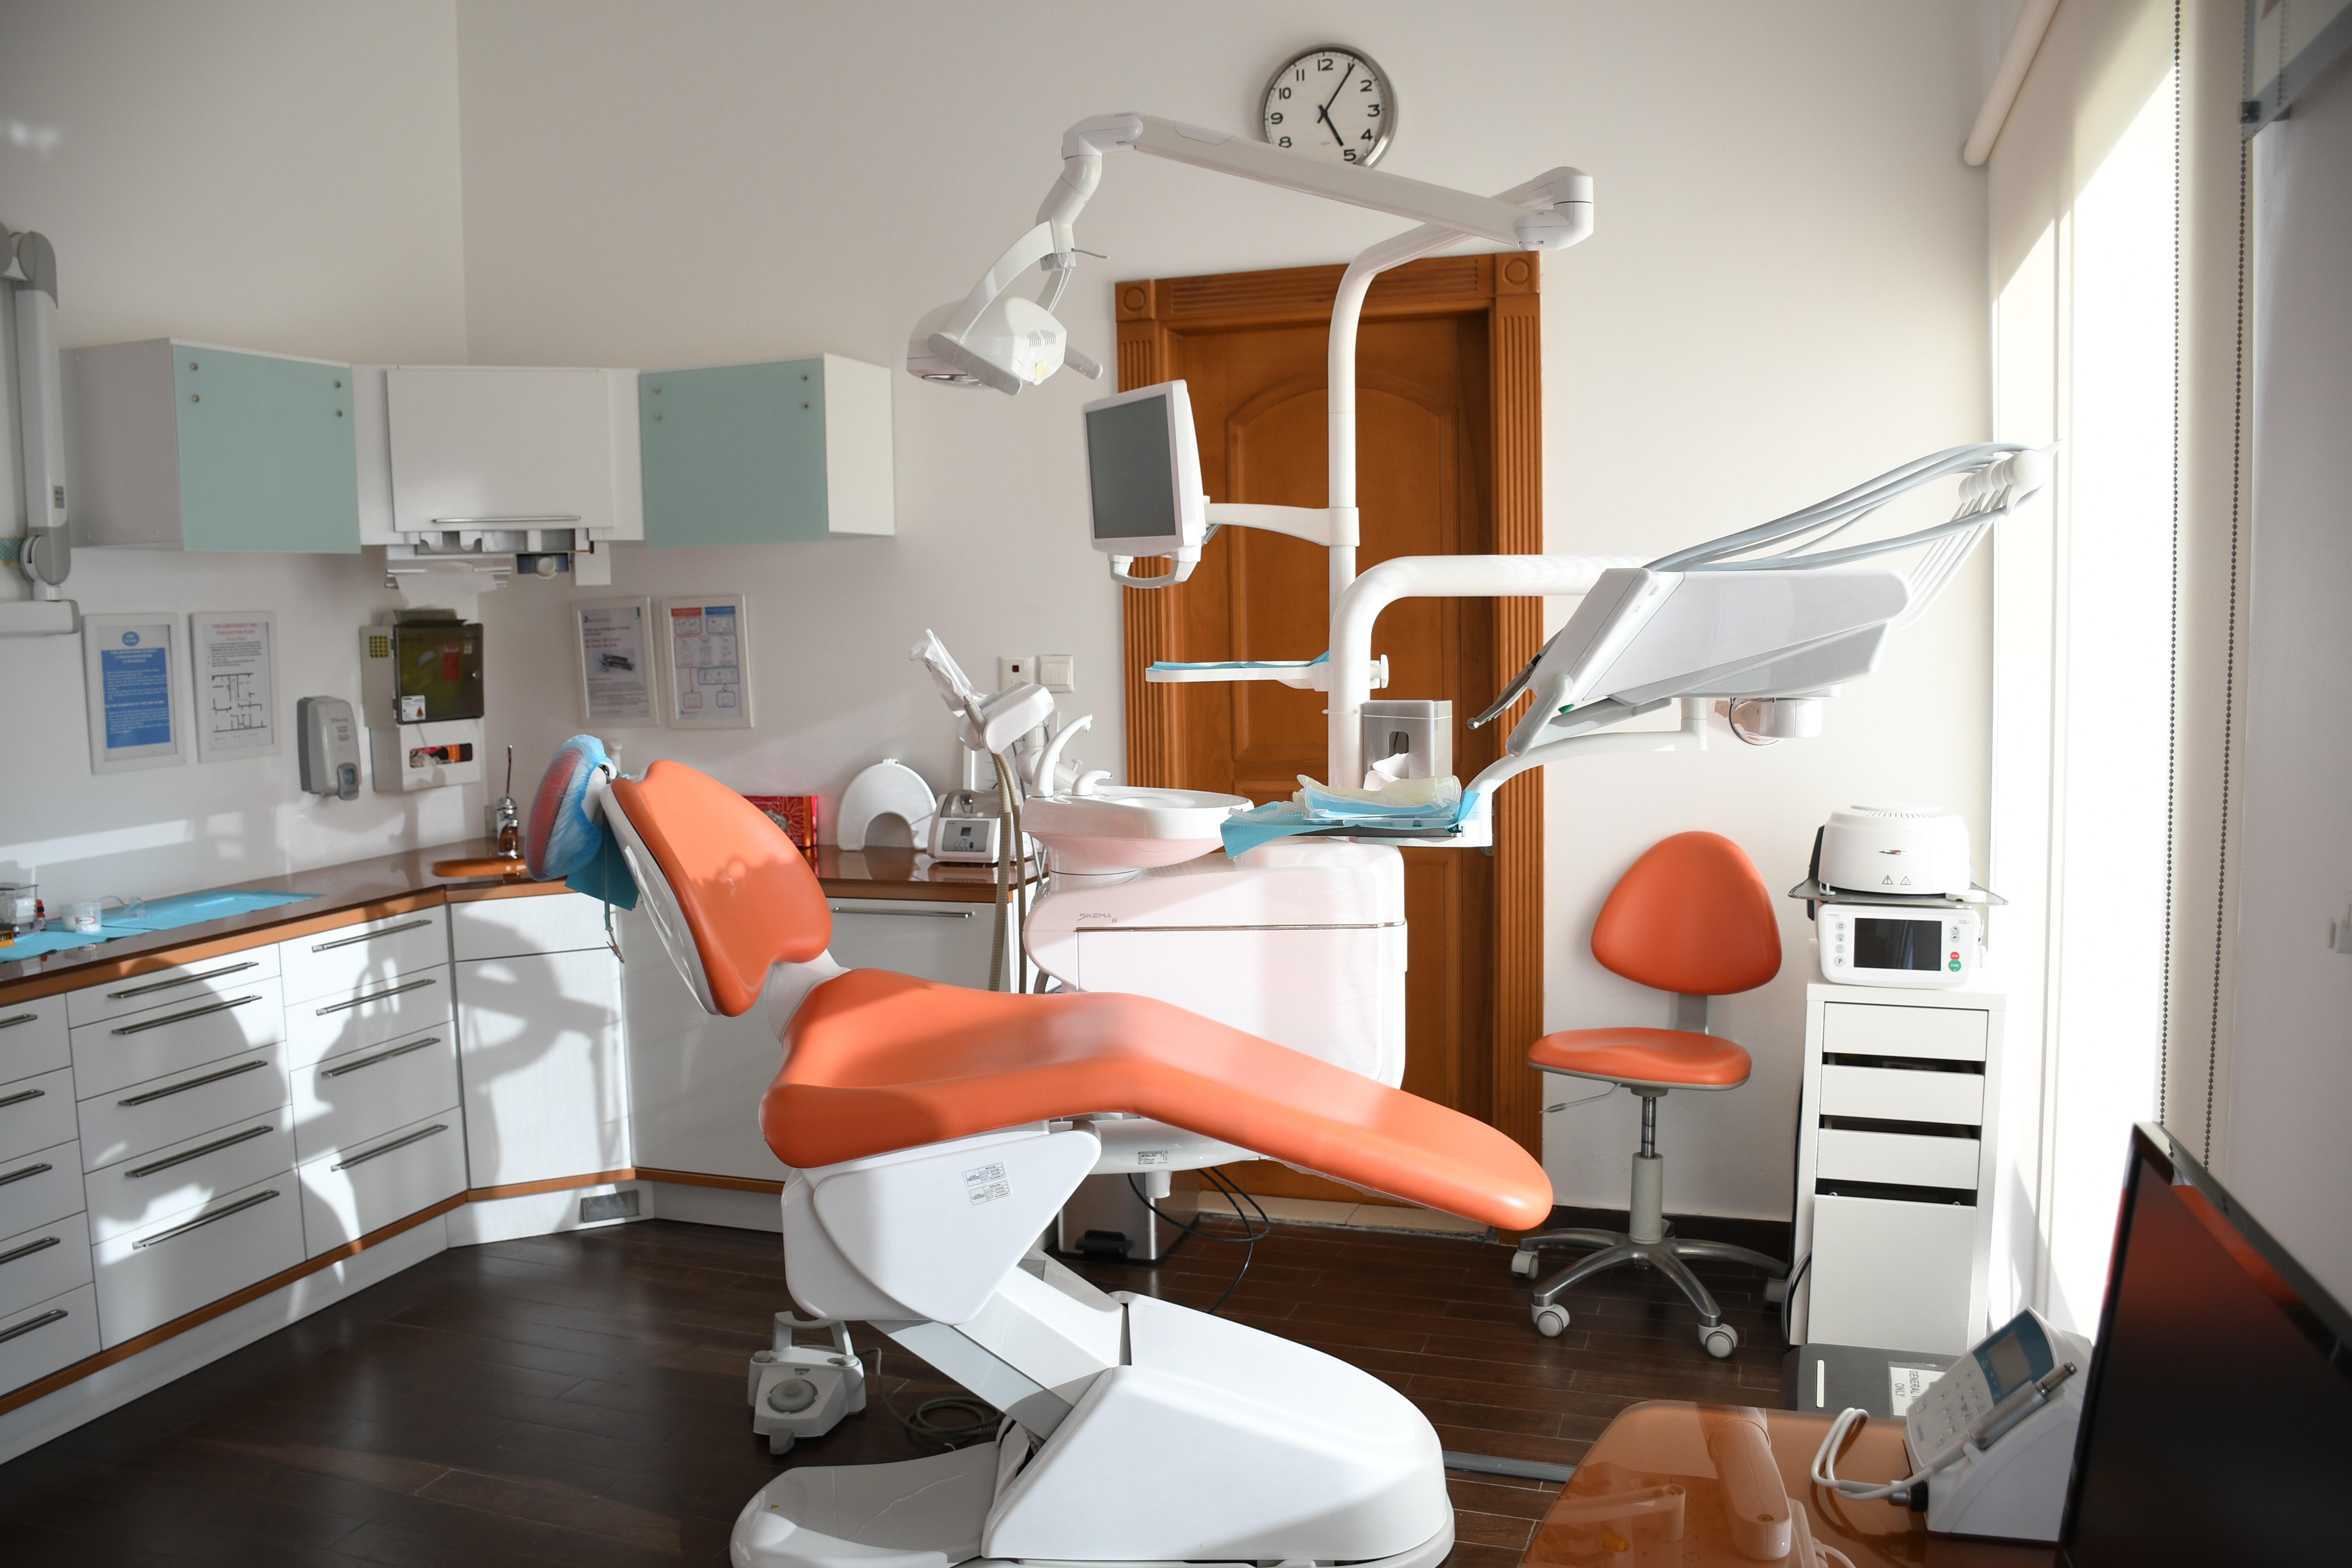 Dental office sanitation services in Philadelphia, PA